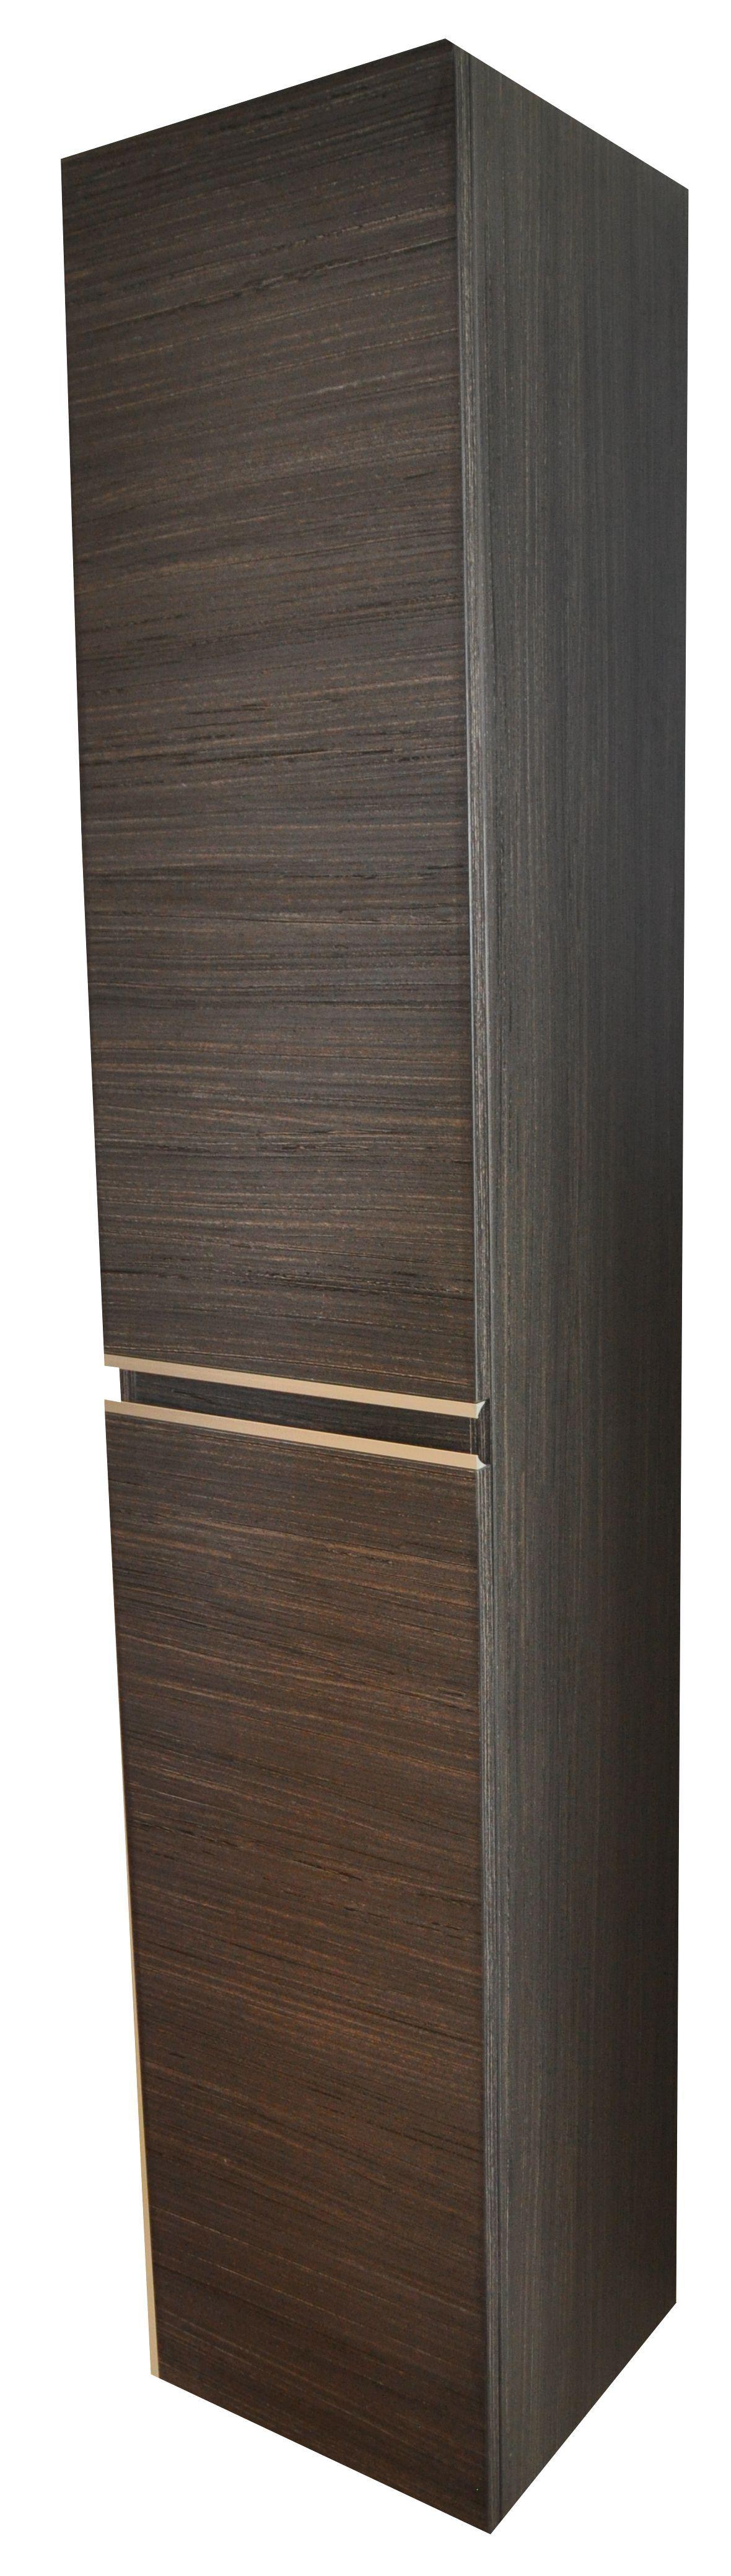 Mueller Lida badkamerkast 160x30x30cm houtnerf grijs